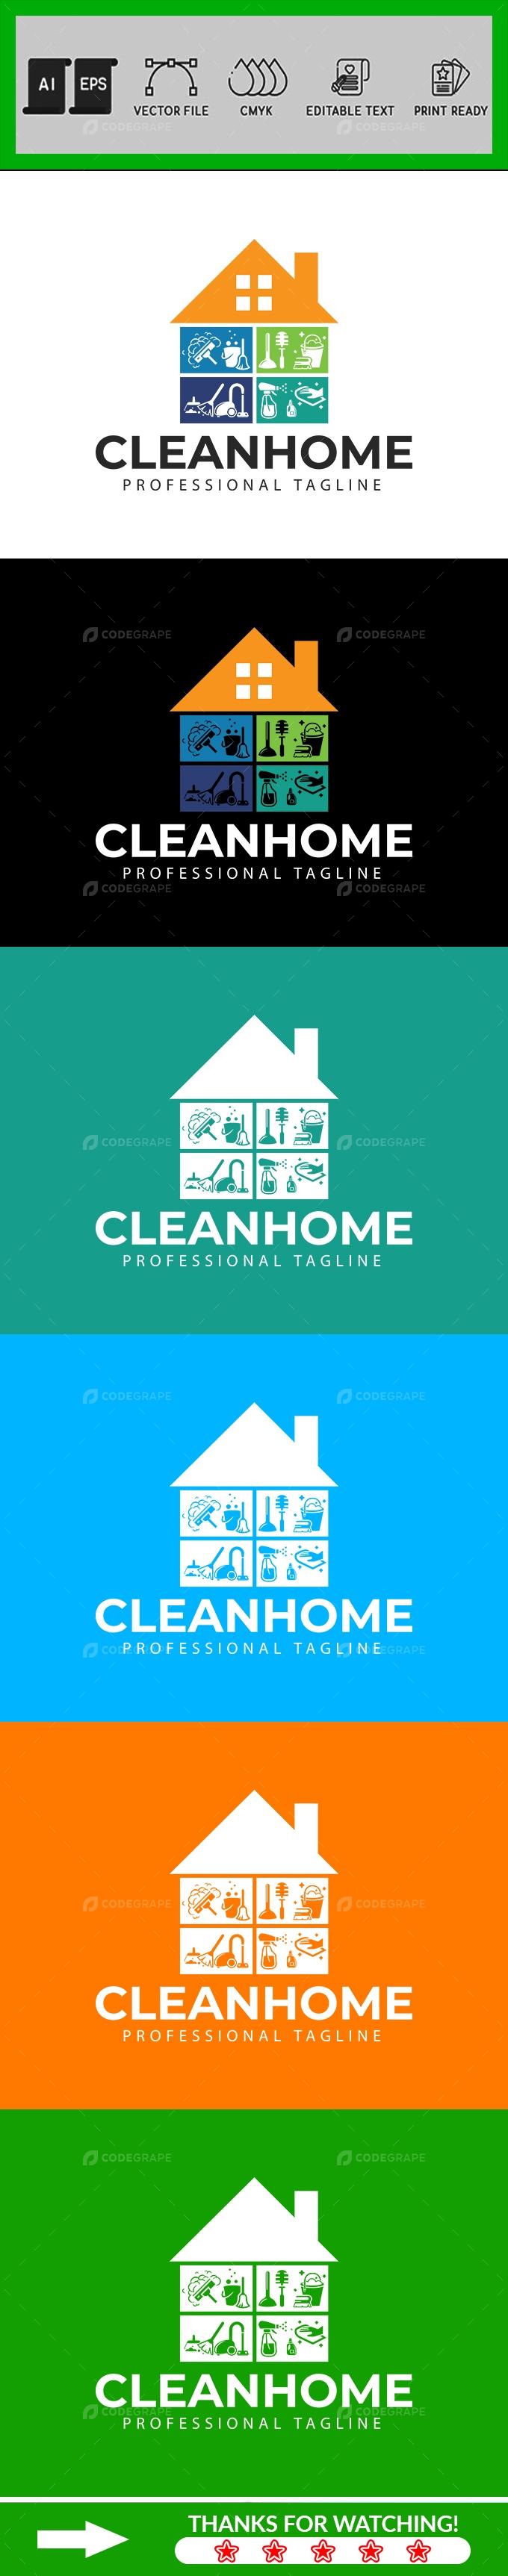 Clean Home Logo Design Template